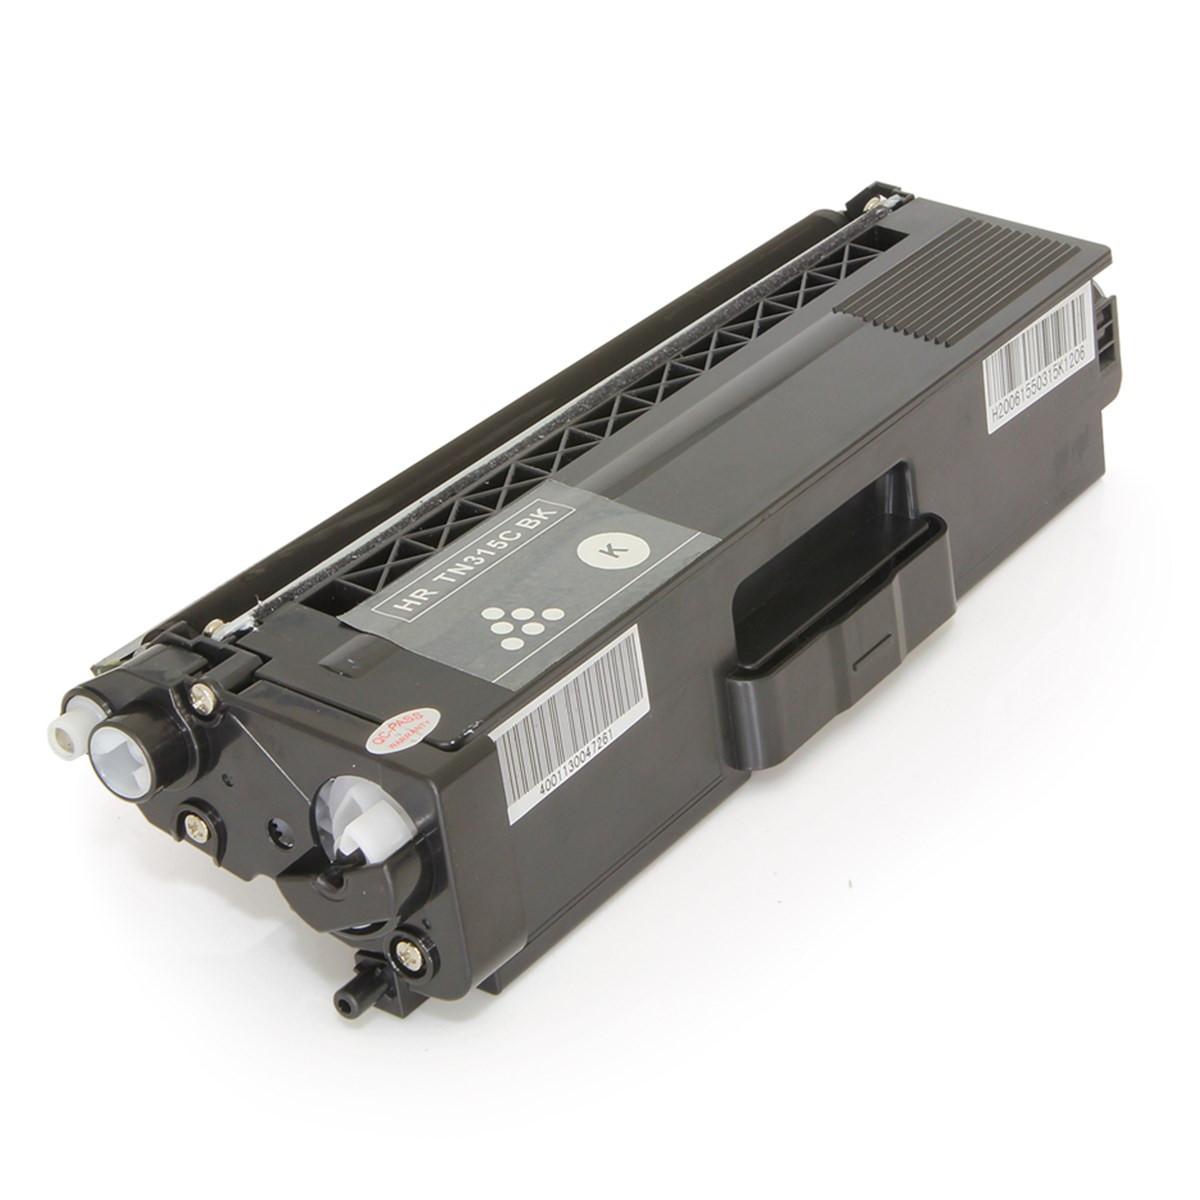 Toner Compatível com Brother TN315 TN315BK Preto | HL4140 HL4150 MFC9970 MFC9460 | Premium 2.5k